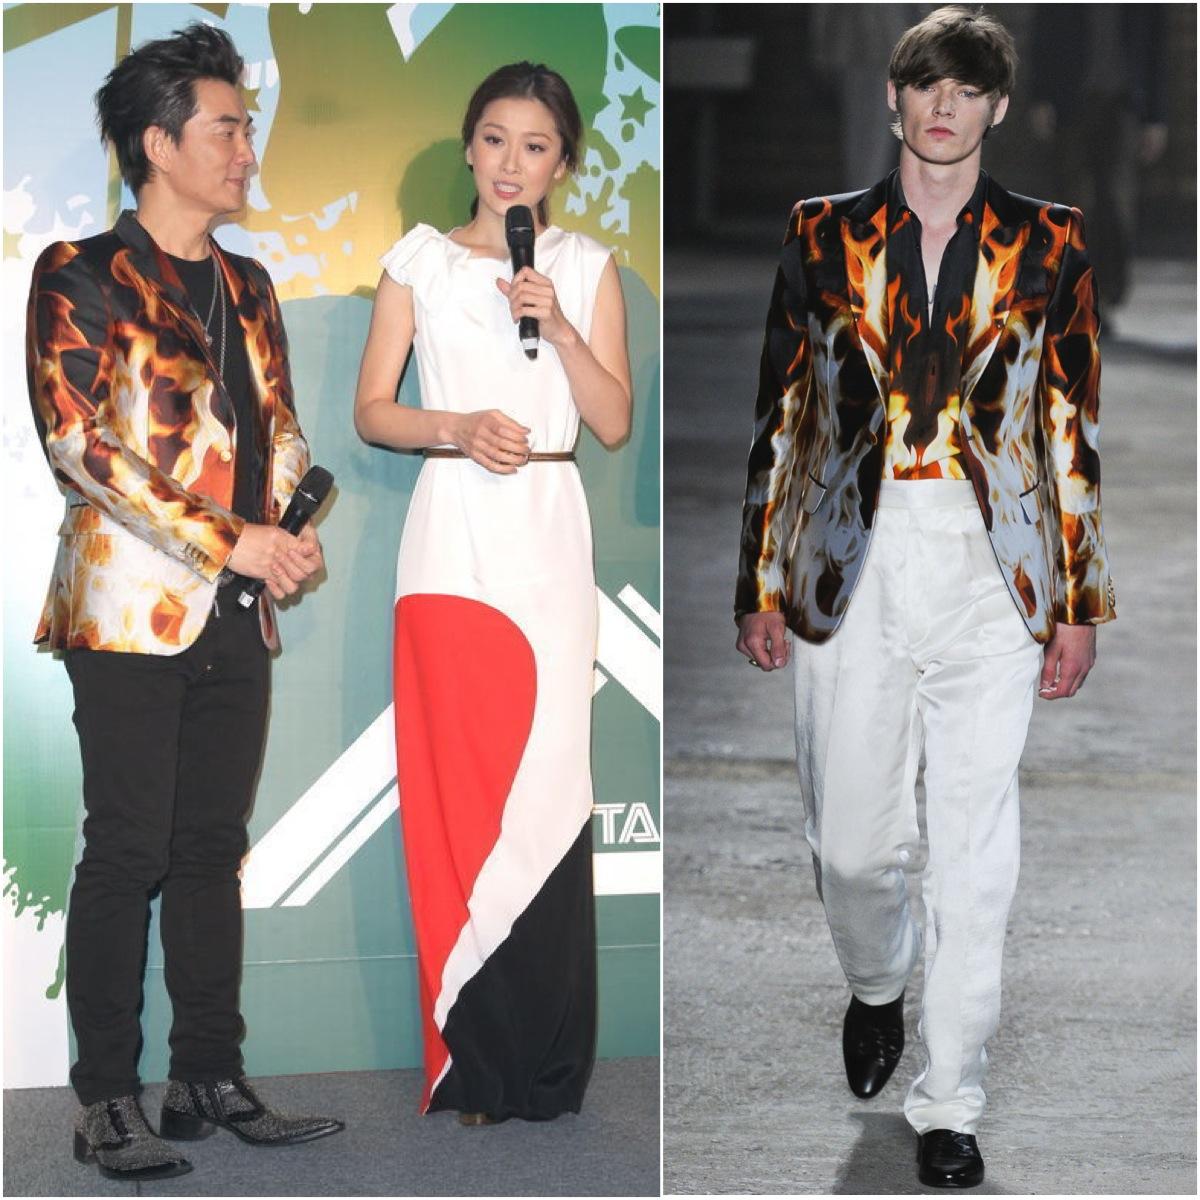 00o00 Menswear Blog Richie Ren [任贤齐] in an Alexander McQueen blazer